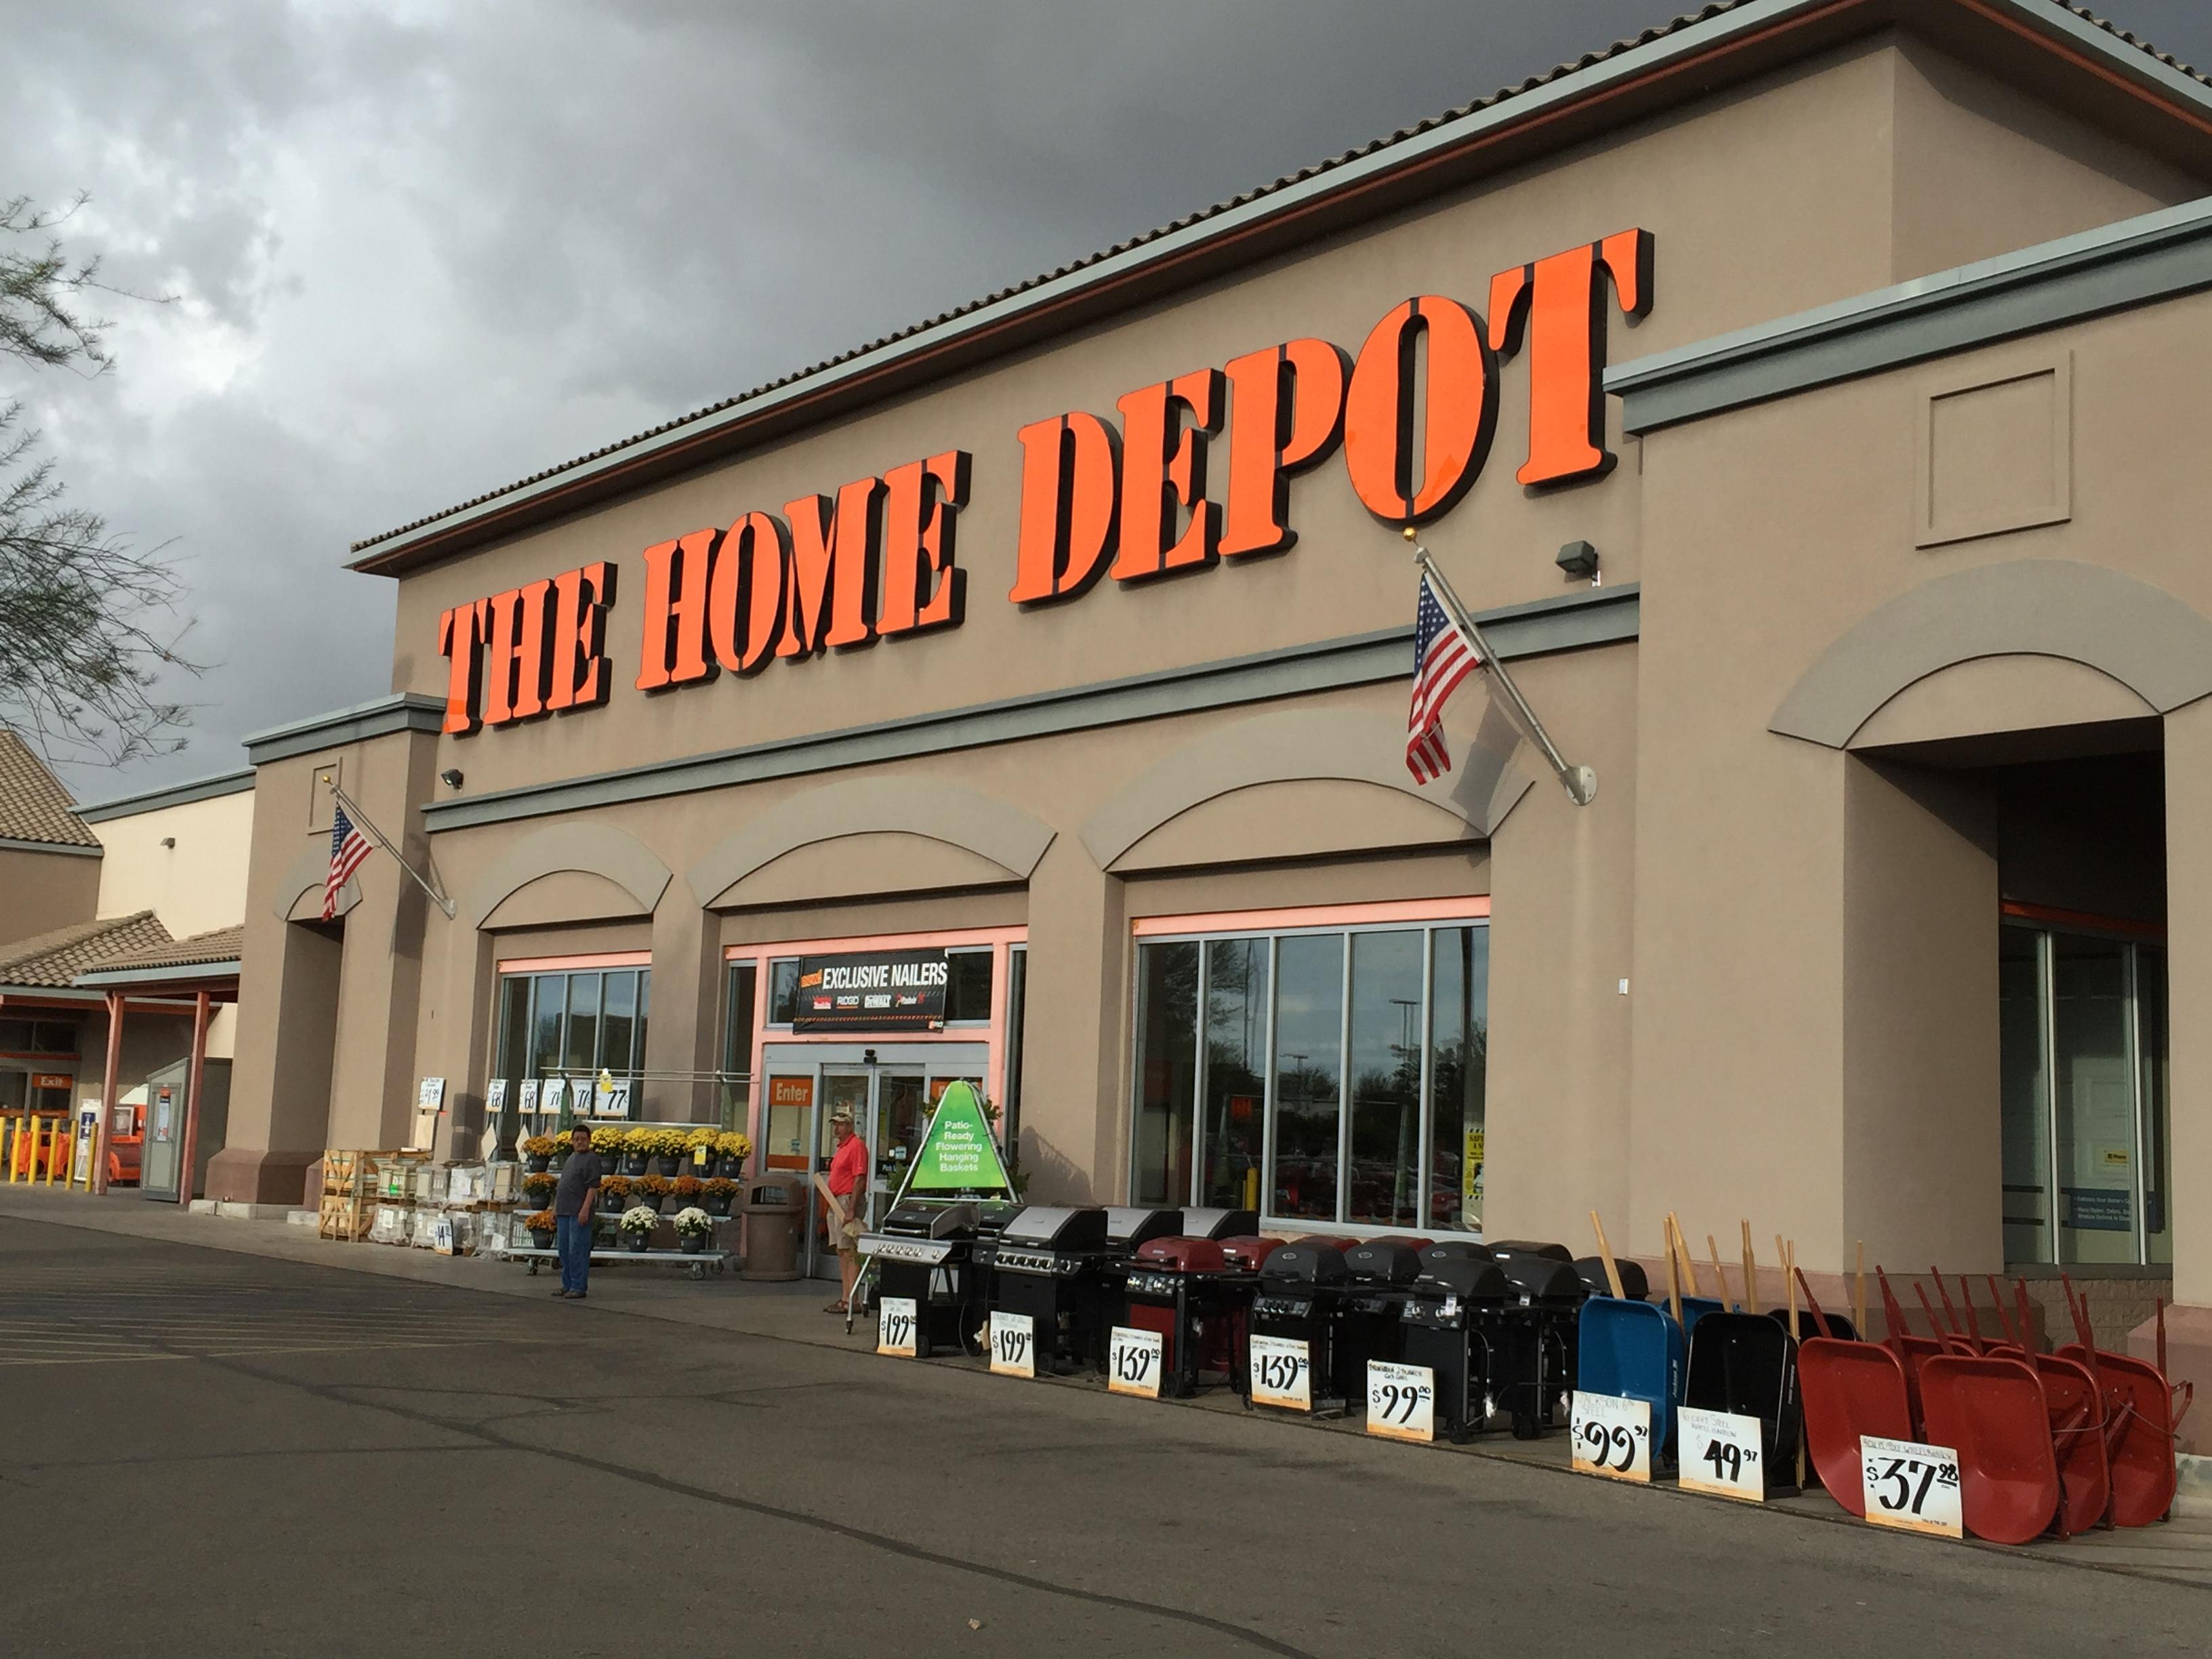 The Home Depot in Tucson AZ Chamberof merce